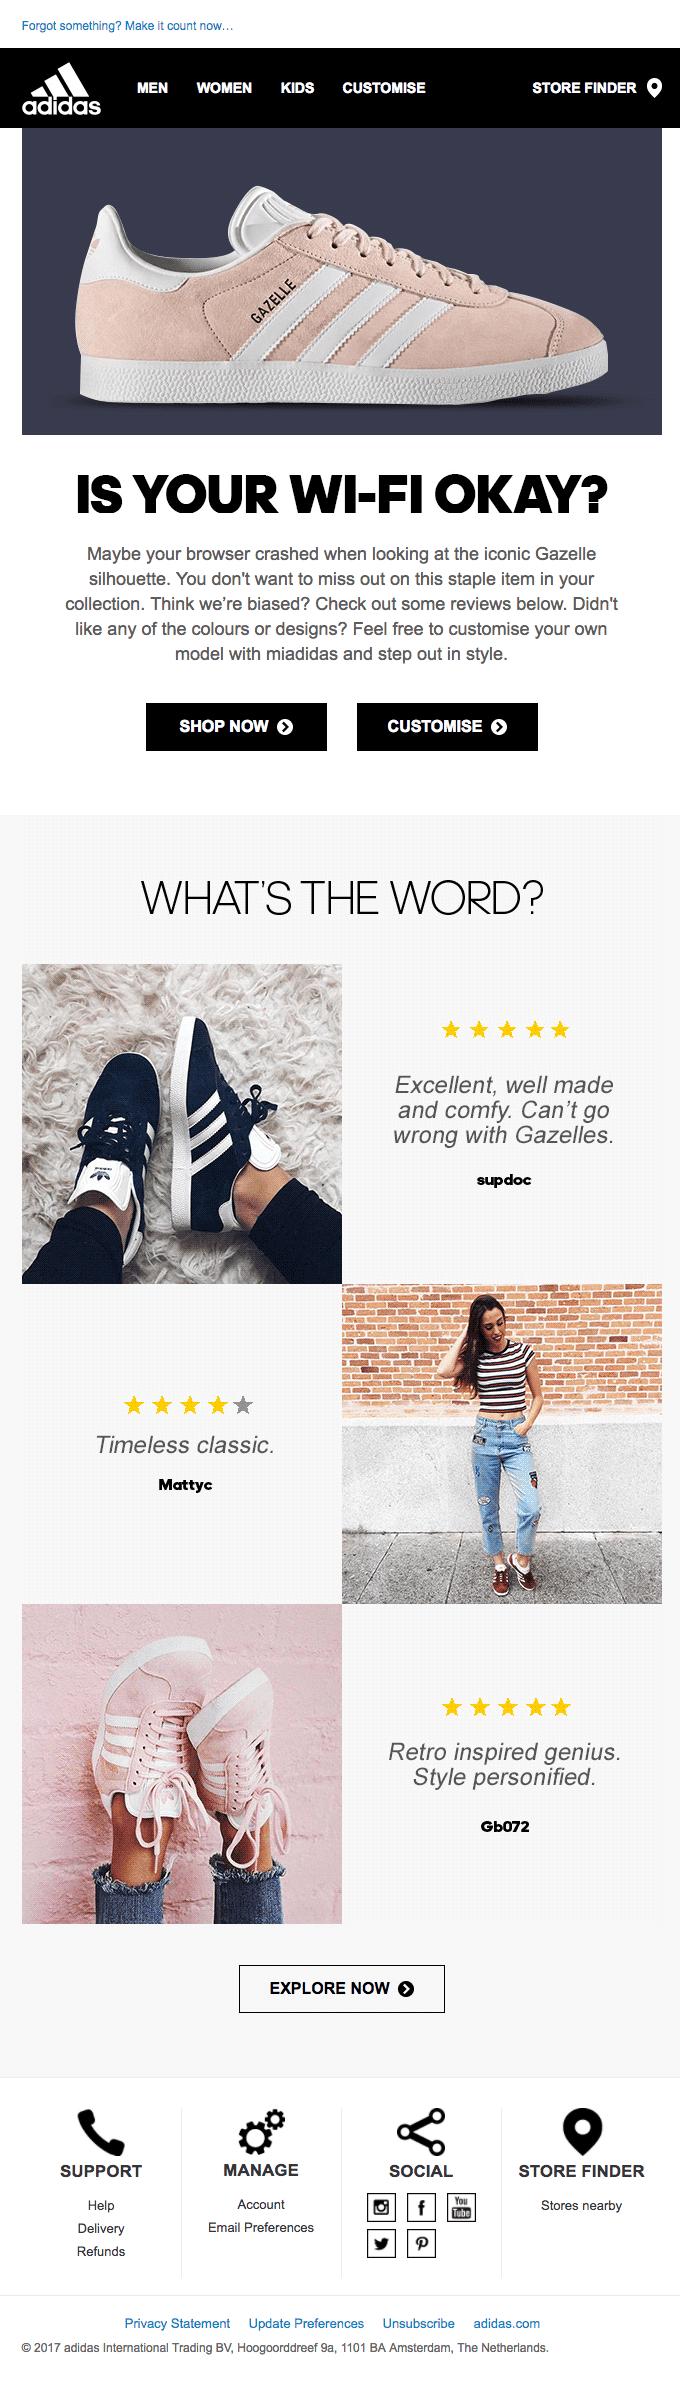 Adidas cart abandonment upsell email